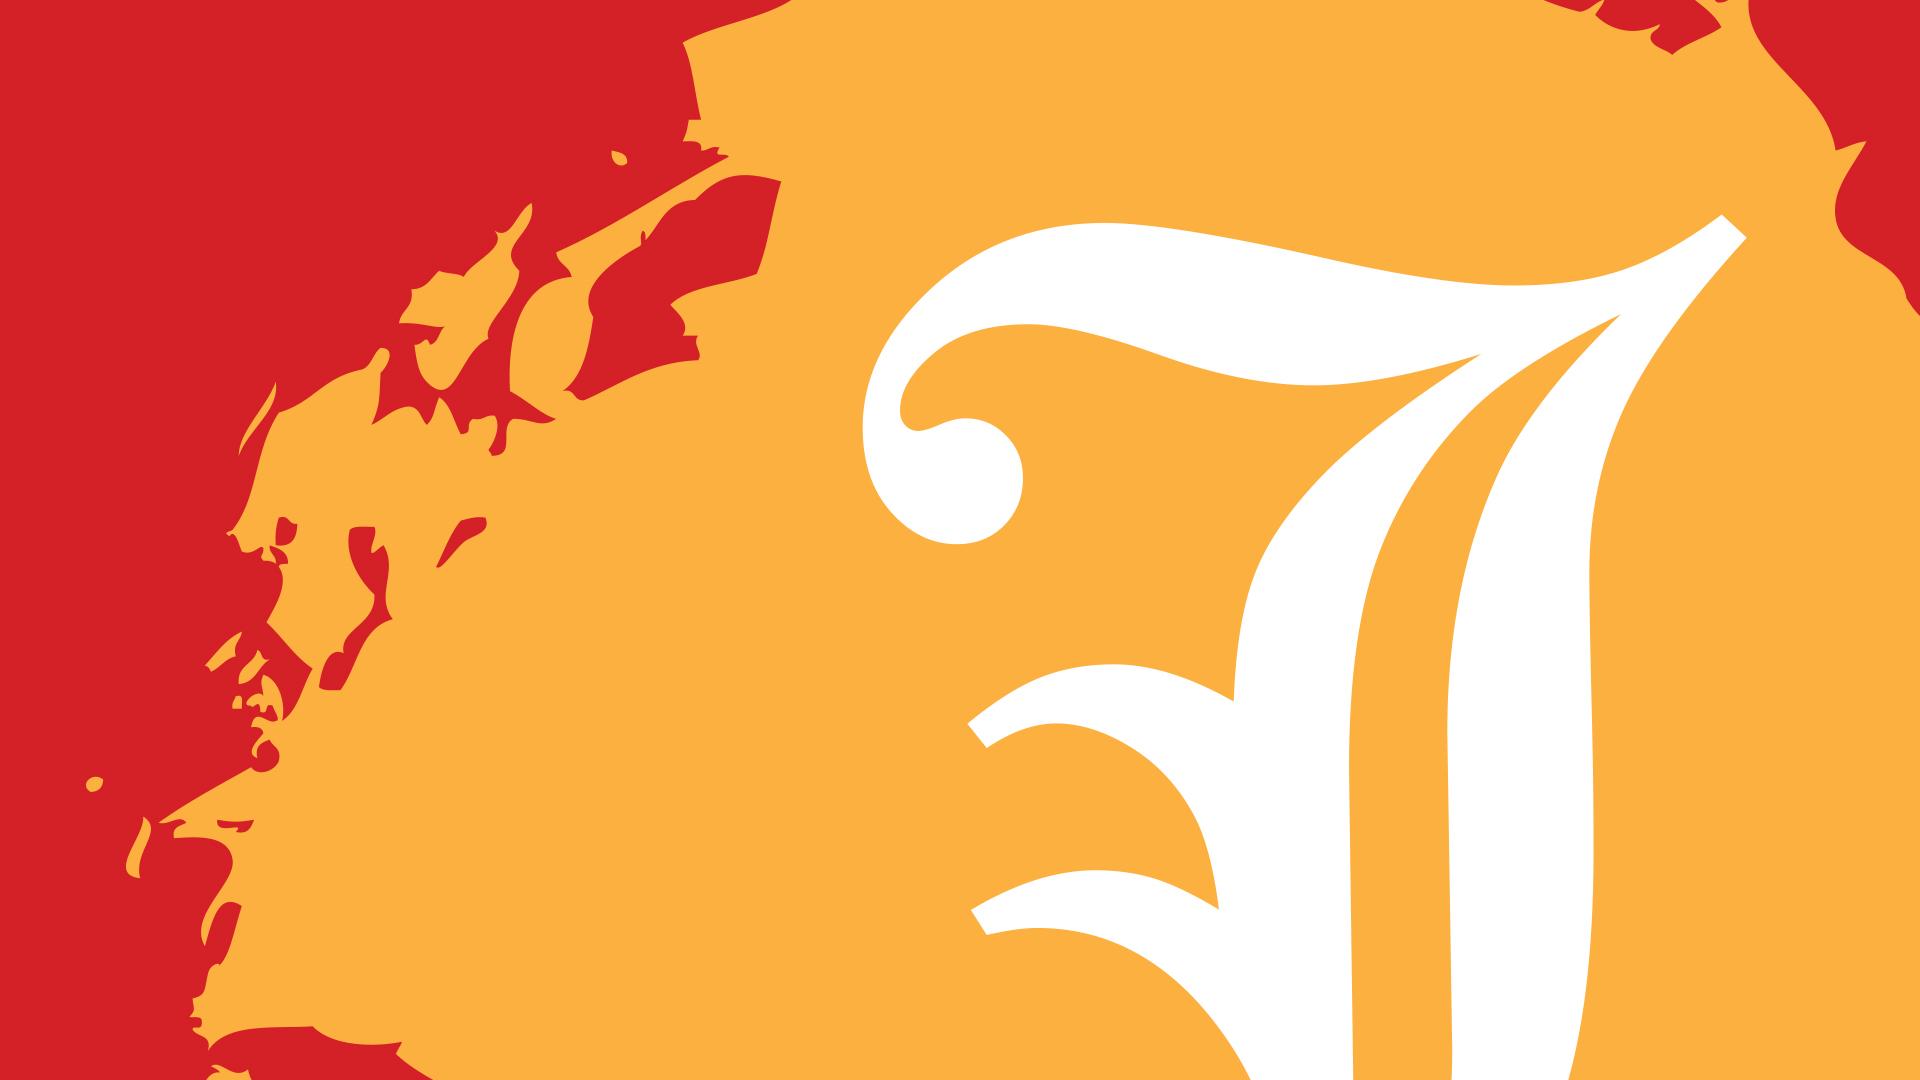 Lynda illustrator tutorials free download - FOREX Trading